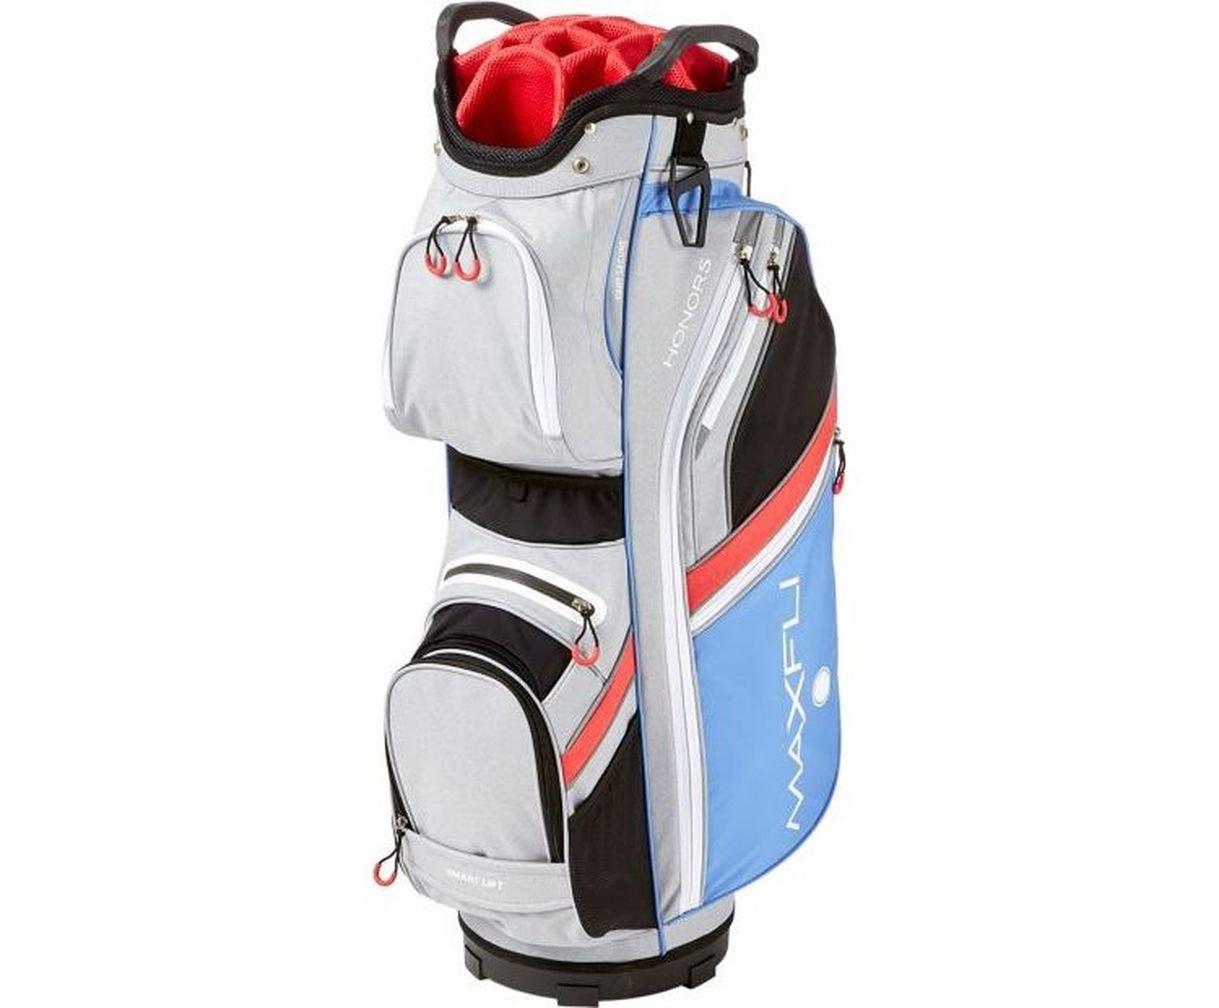 Maxfli Women's 2018 Cart Golf Bag - 14 Way - 10 Pockets - Gray/Coral/Blue